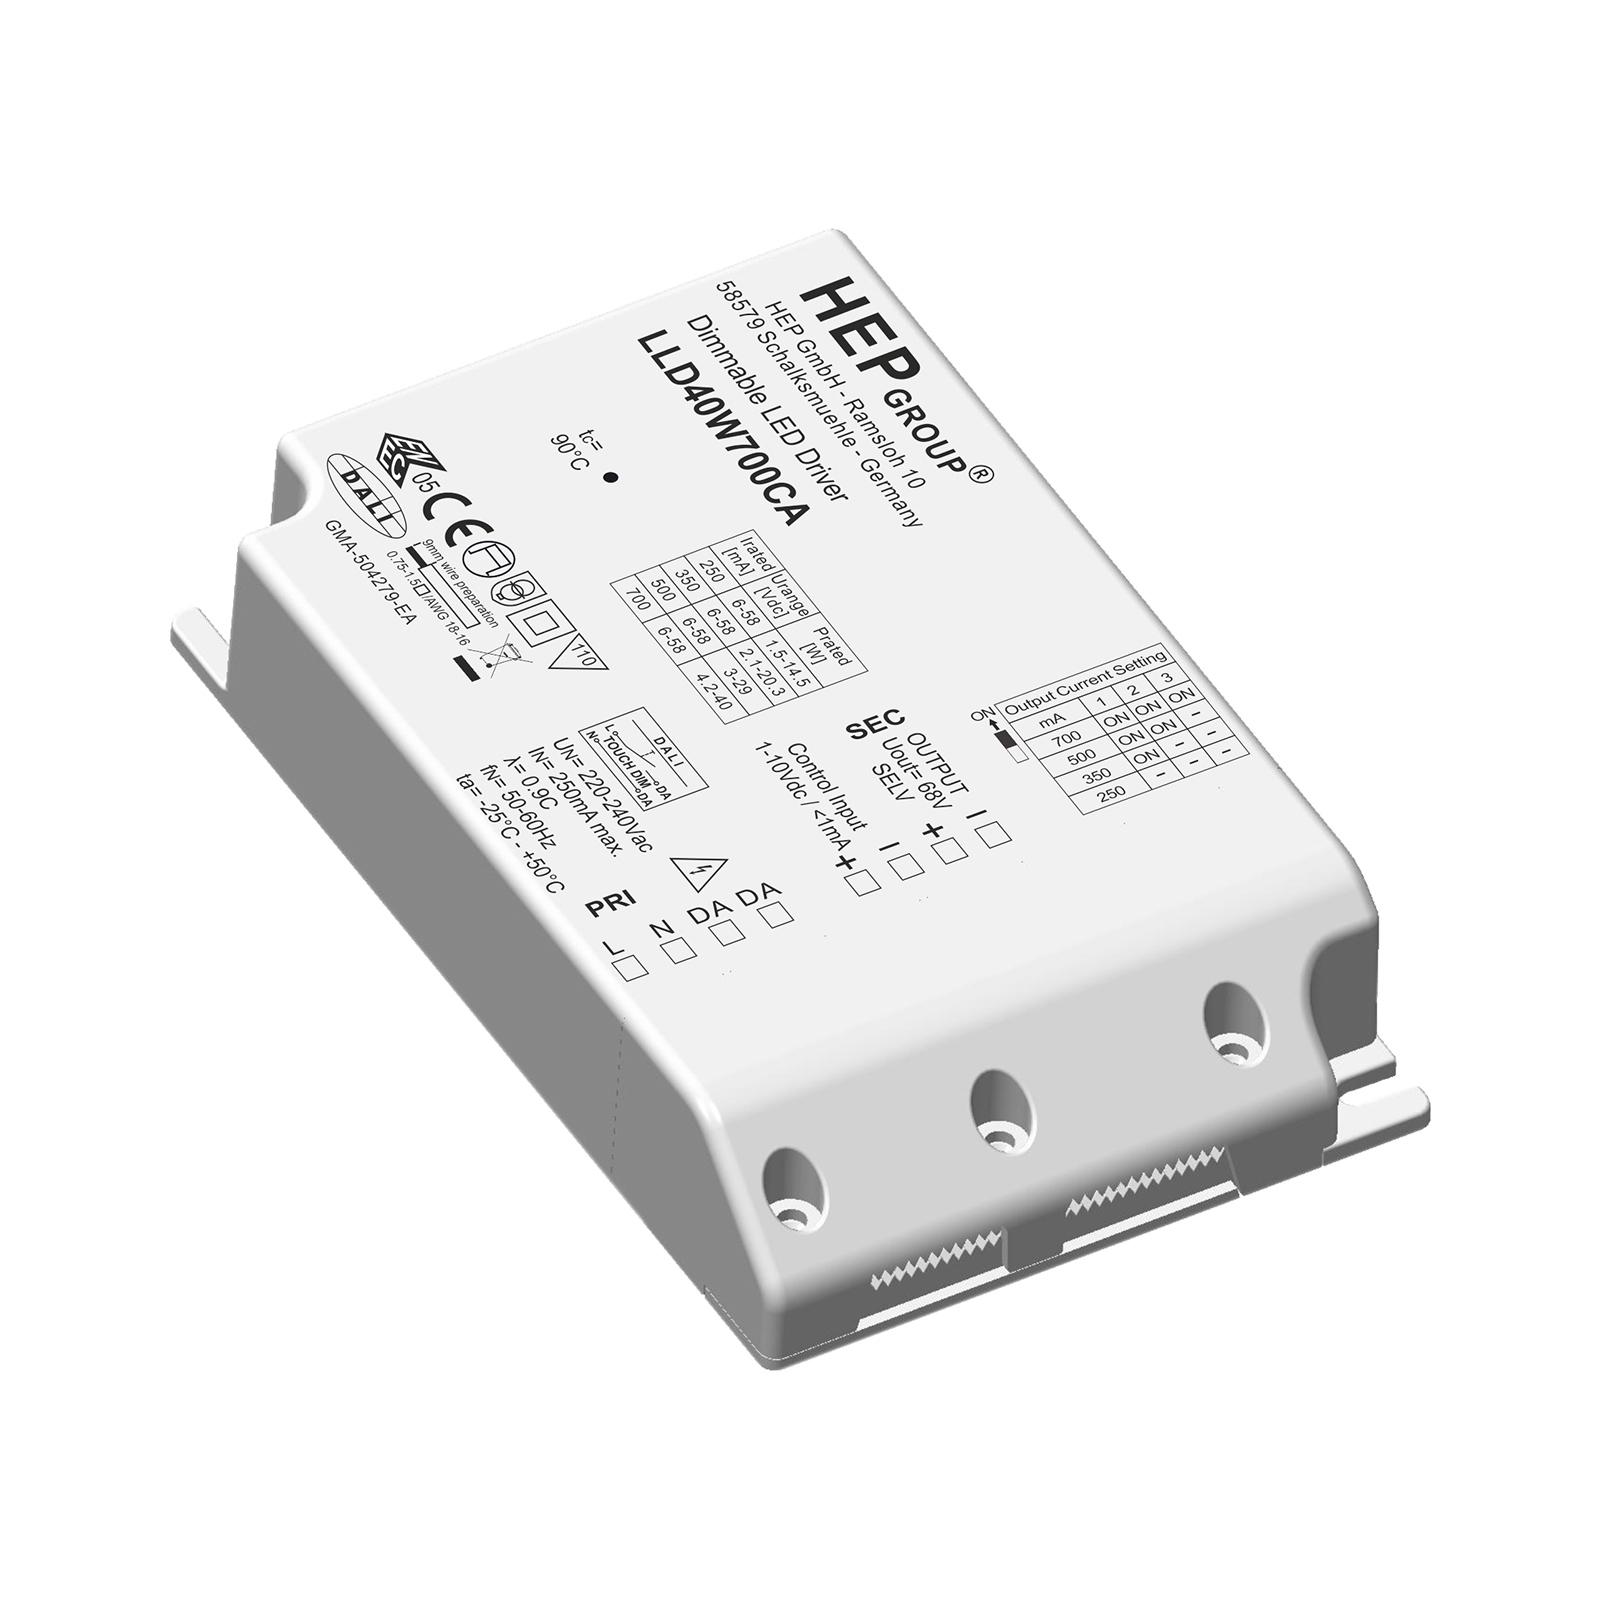 LED-Treiber LLD, 40 W, 700 mA, dimmbar, CC